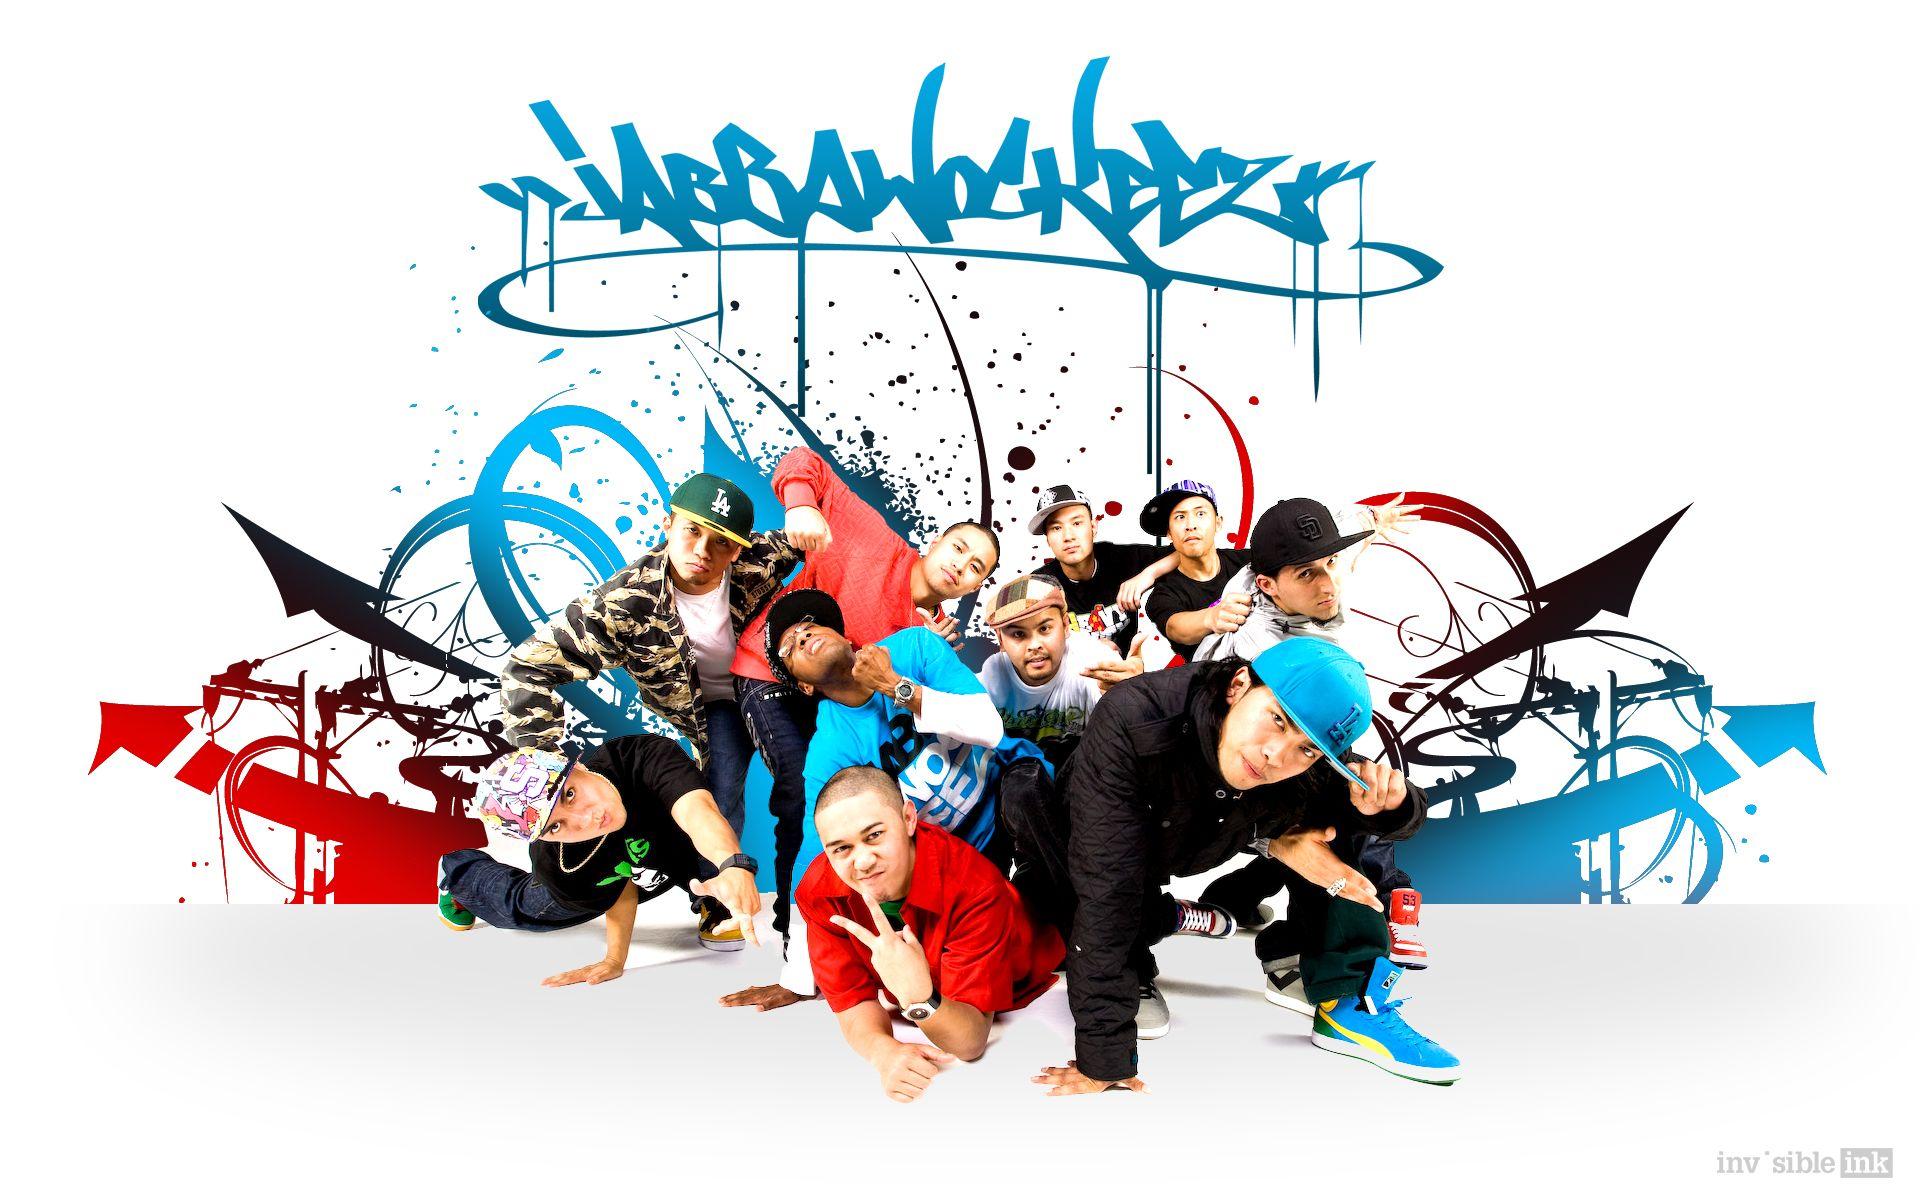 ABDC JabbaWocKeeZ Unmasked Dance wallpaper, America